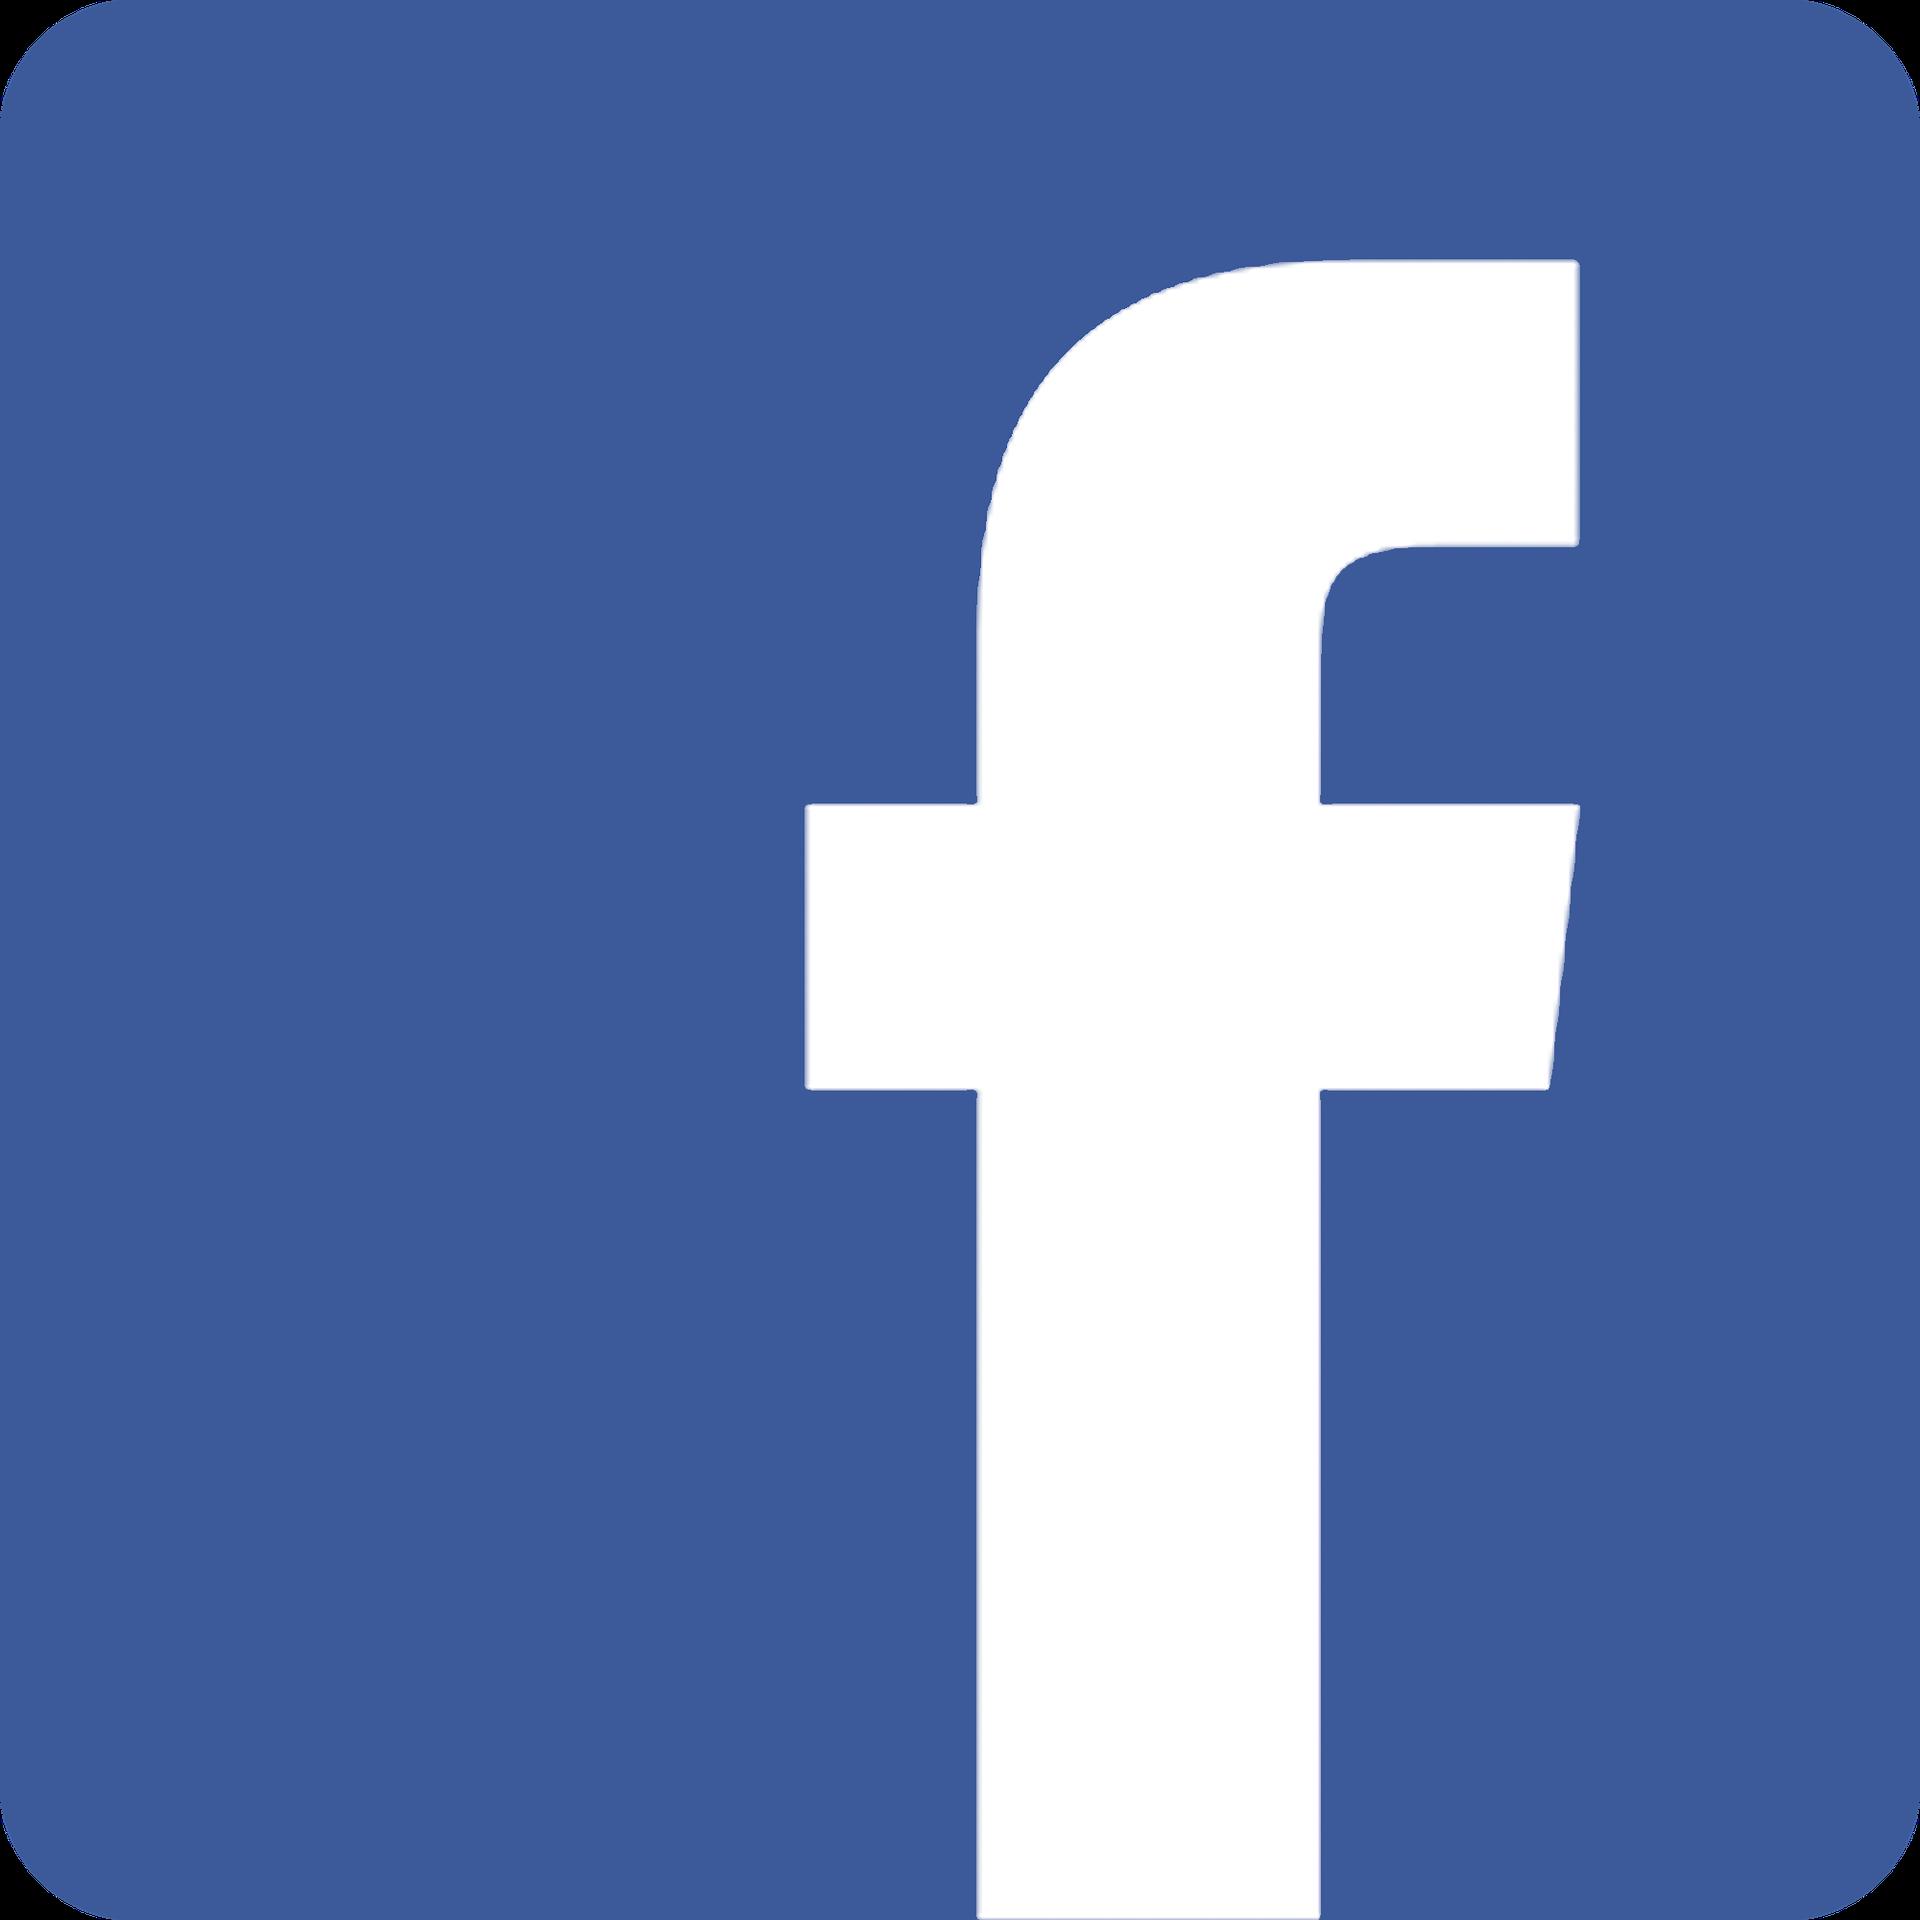 http://www.renteo.fr/userfiles/facebook-770688_1920.png